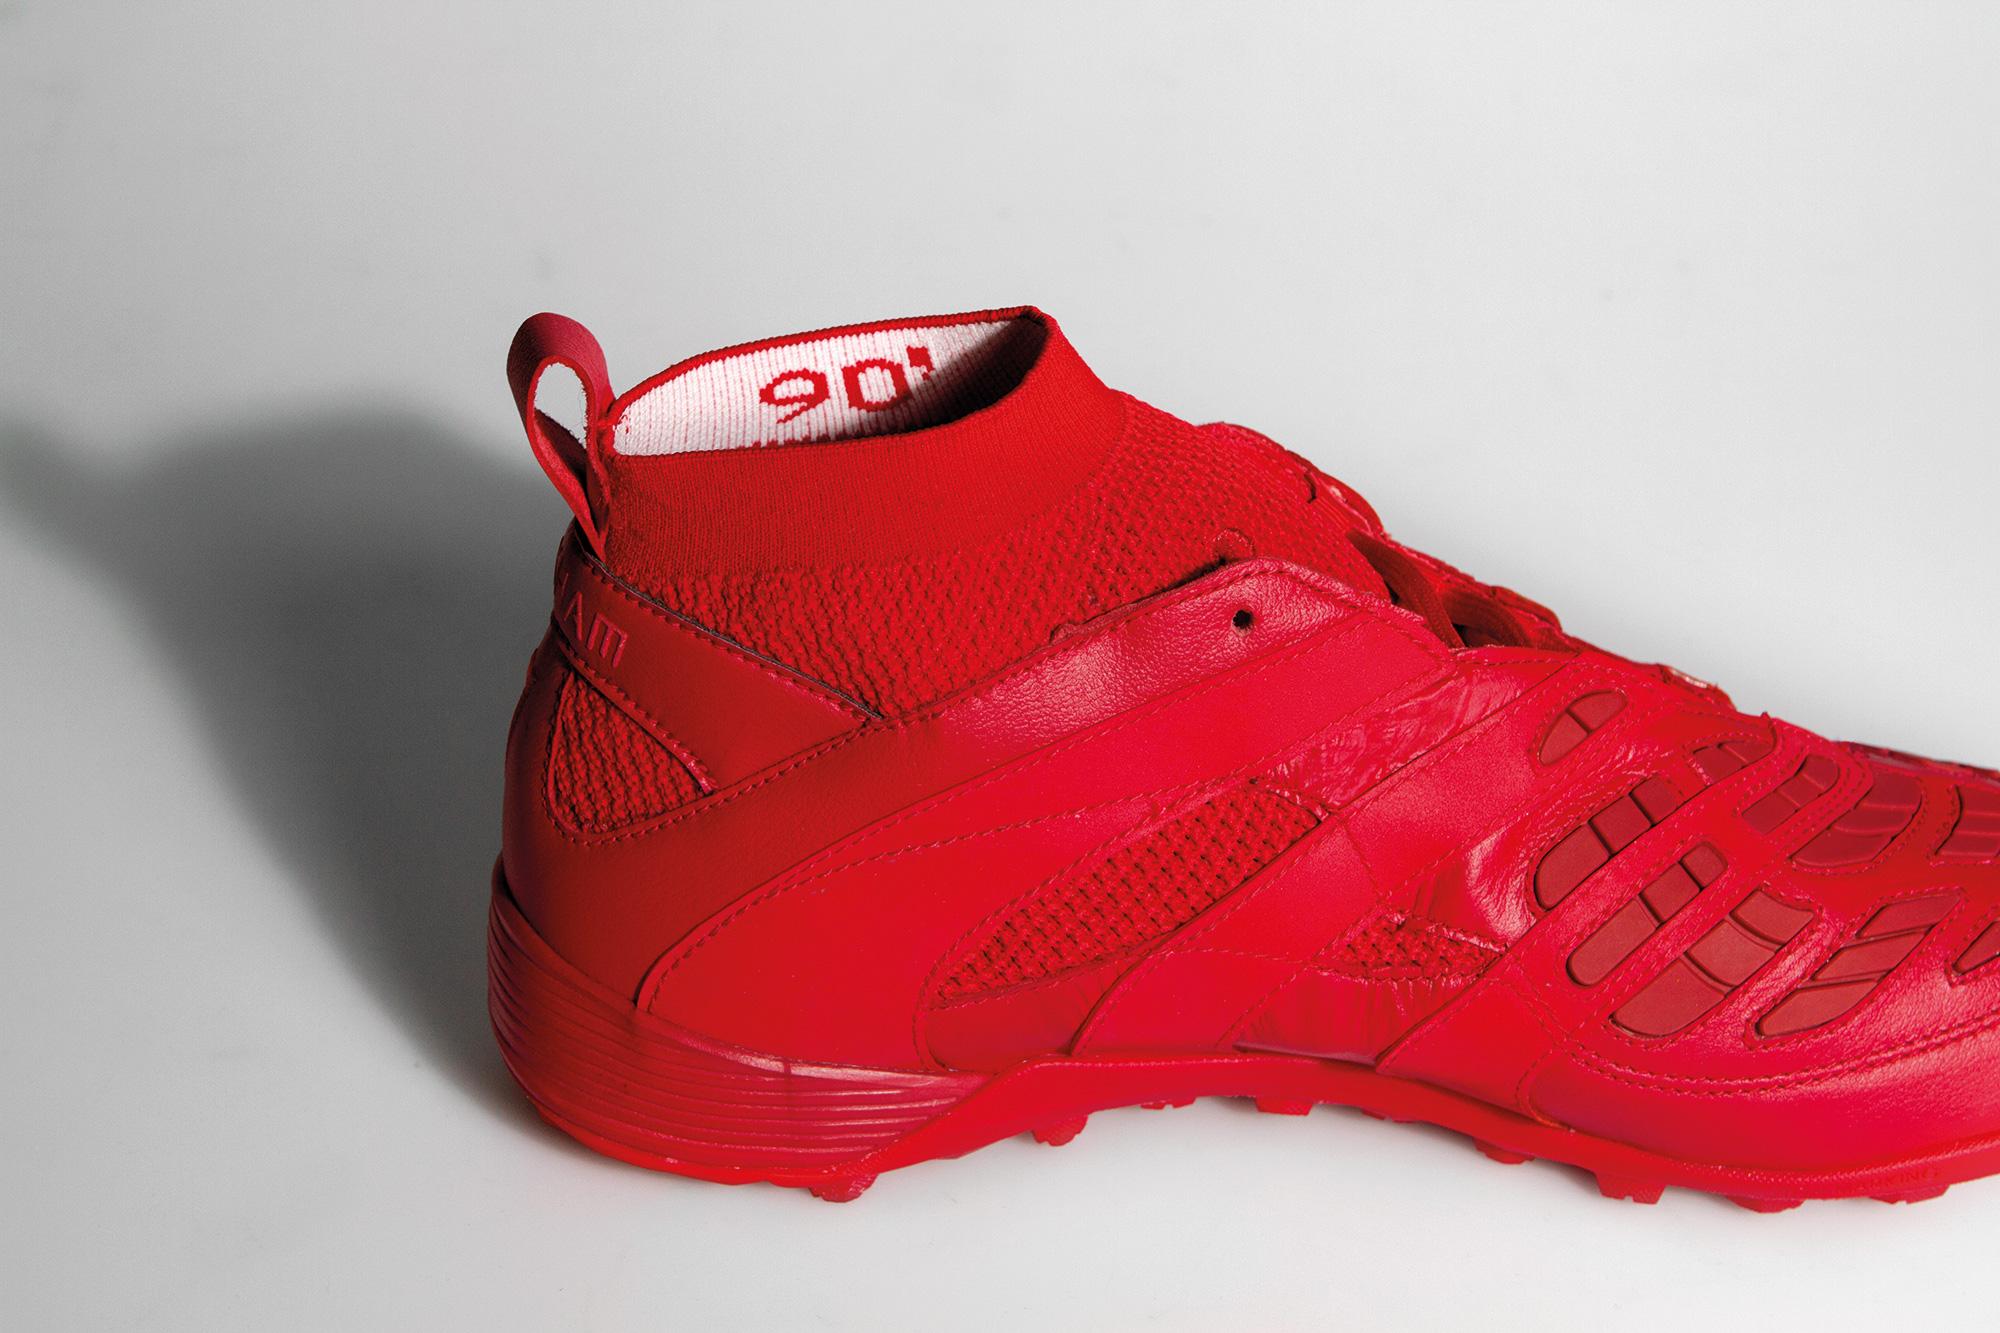 adidas-beckham-collection-red-2